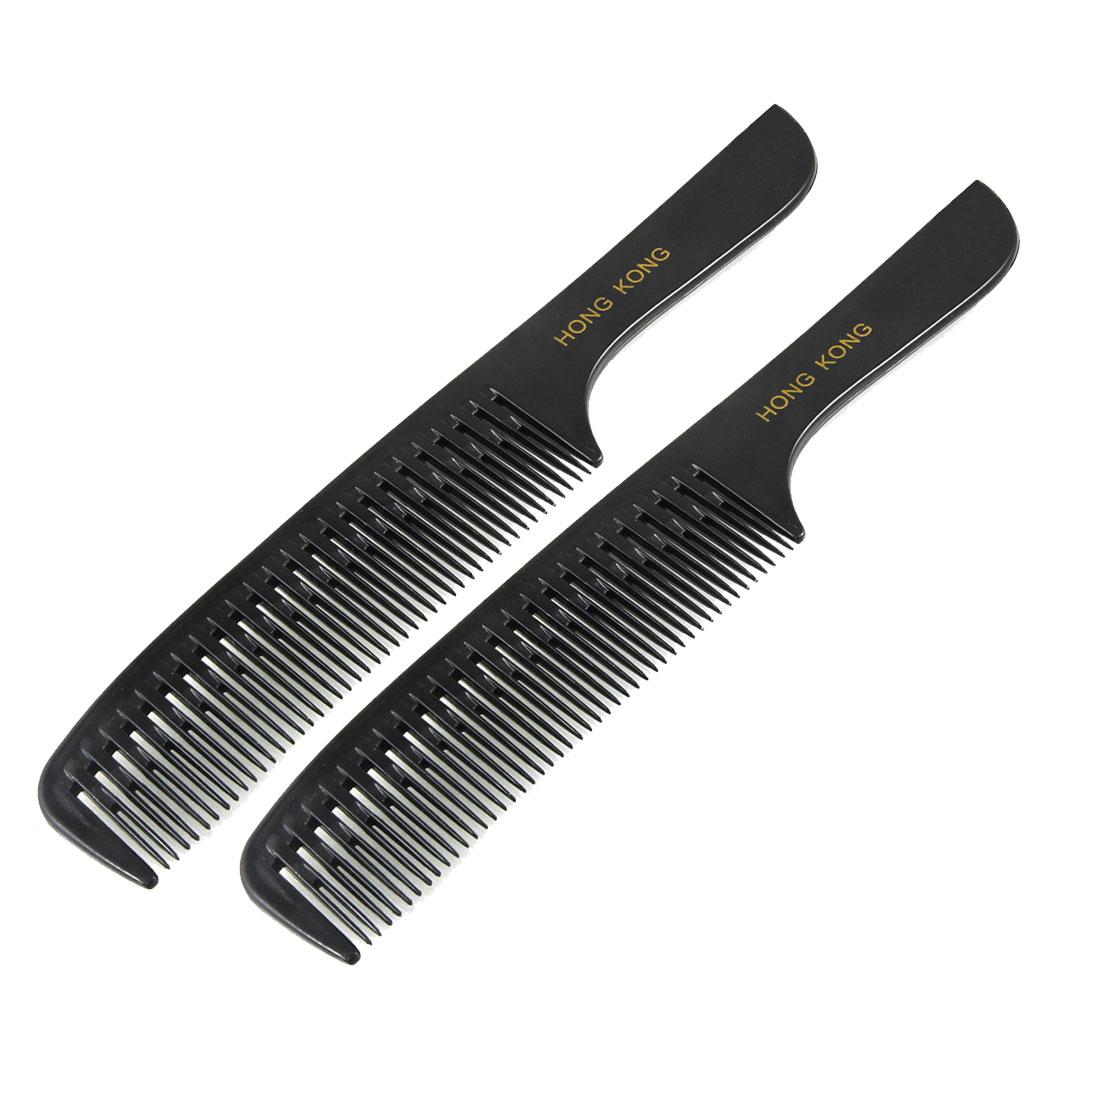 "Lady Hairstyle DIY Black Plastic Curly Hair Care Handgrip Comb 8.3"" 2 Pcs"